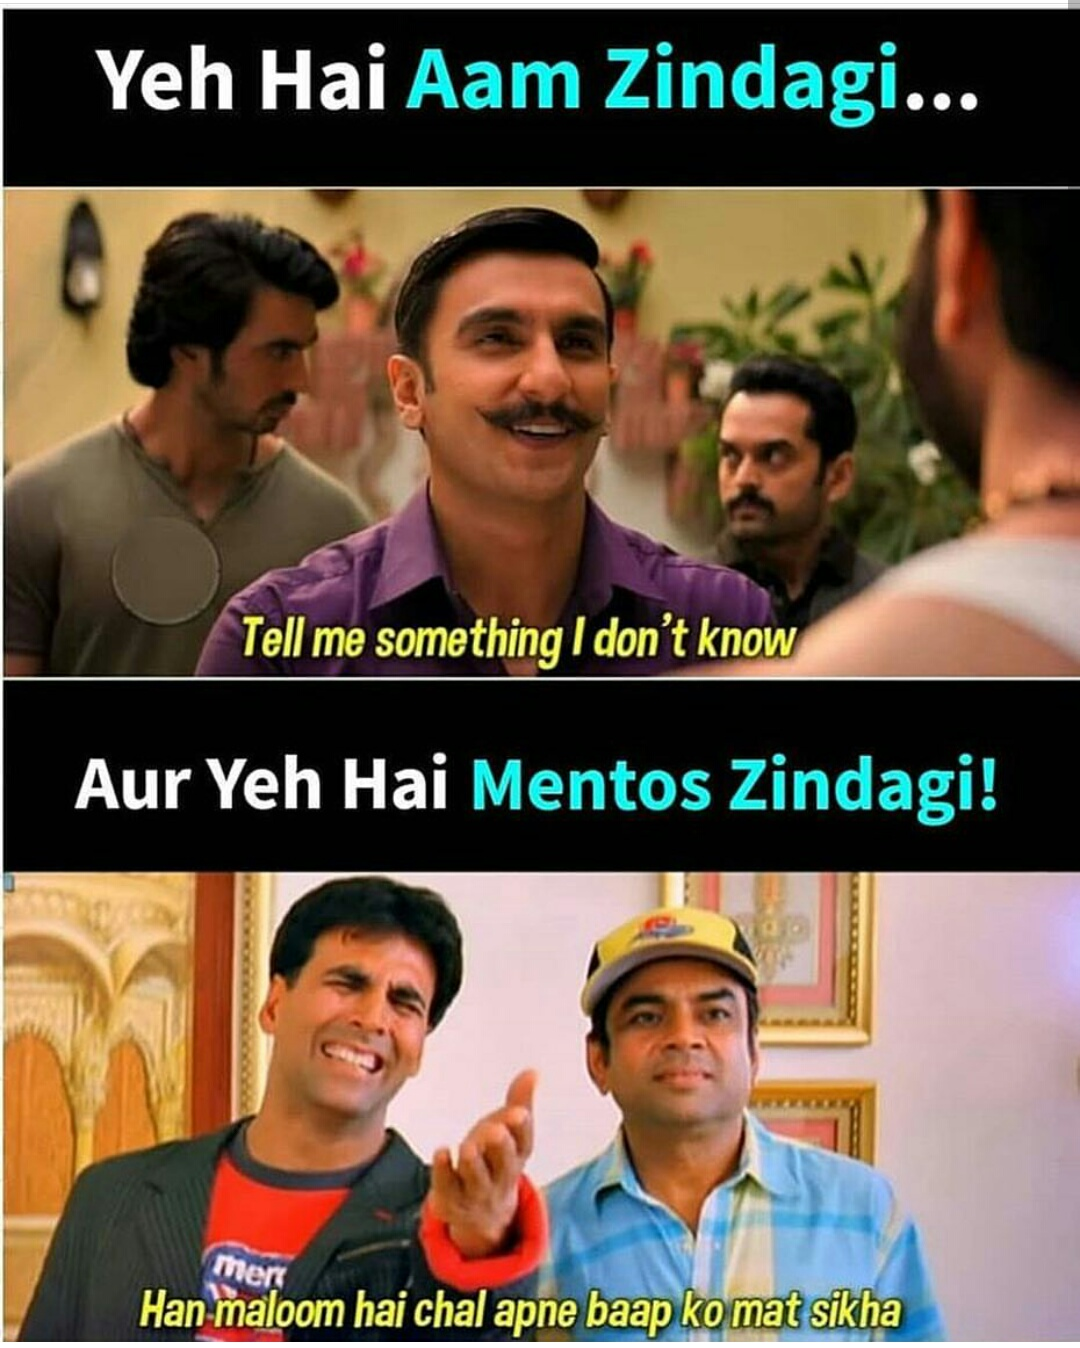 Kumpulan Soal Bollywood Funny Memes Instagram